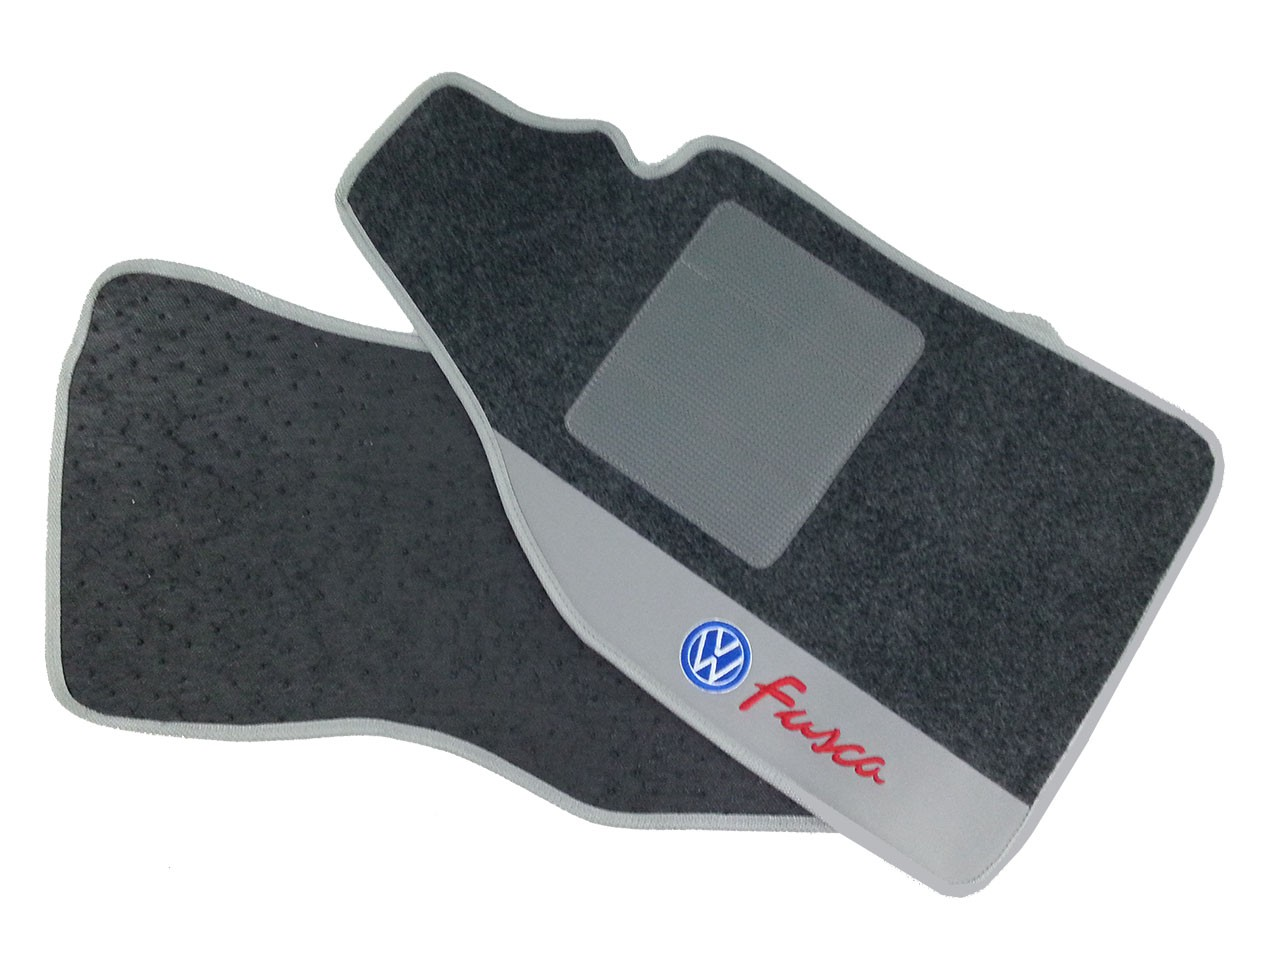 Tapete Vw Fusca Novo Carpete Premium  Base Pinada